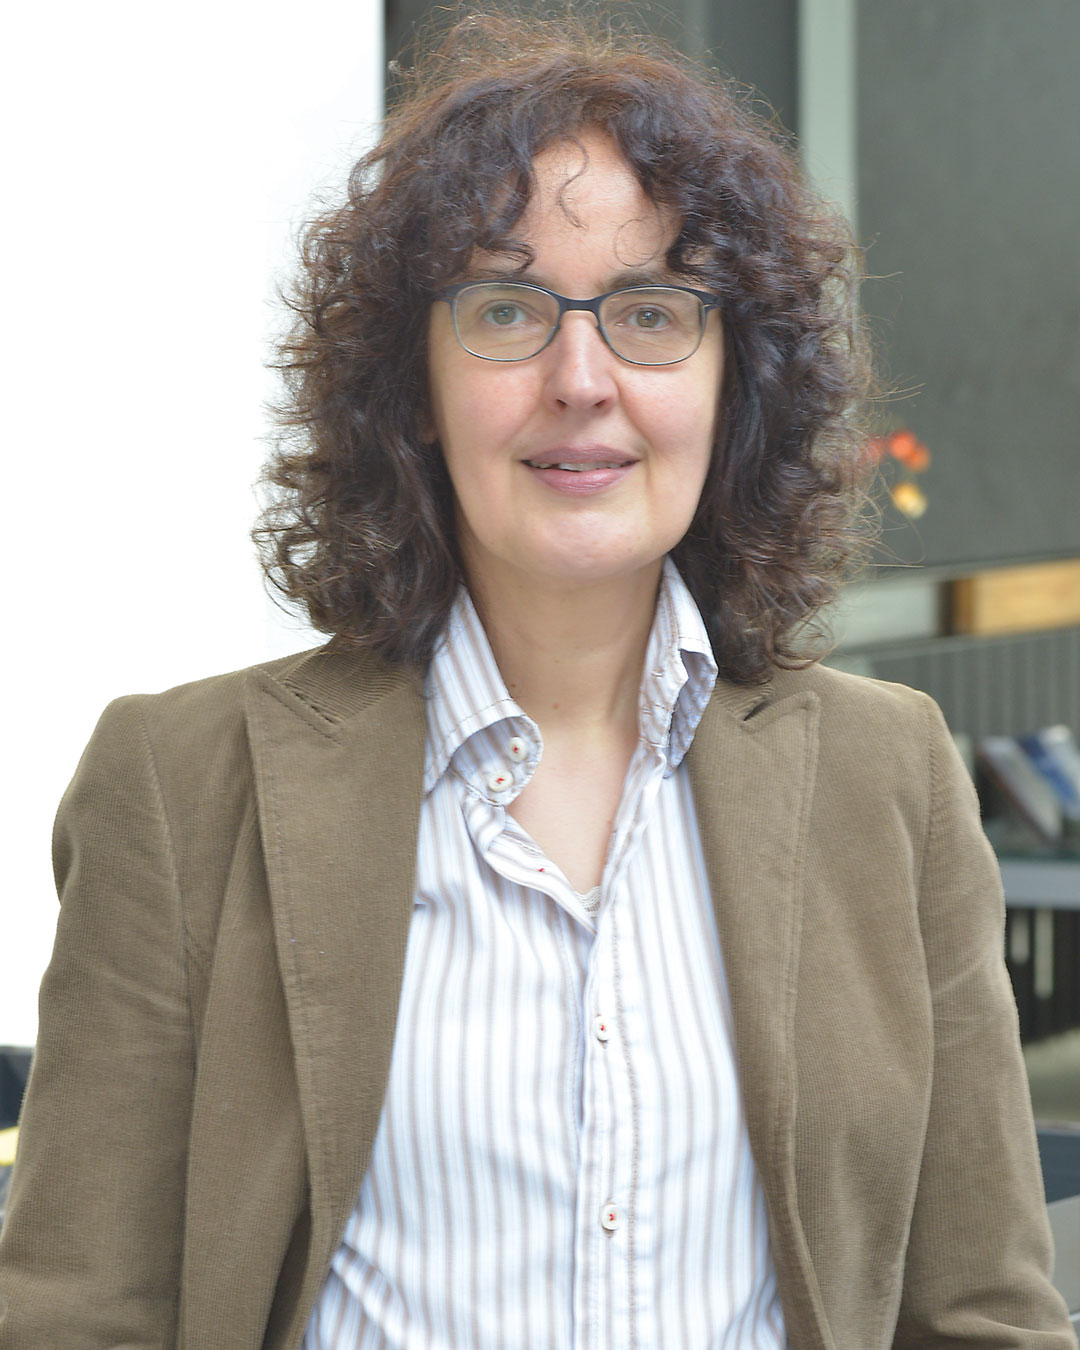 Juliane Brandes, 2017